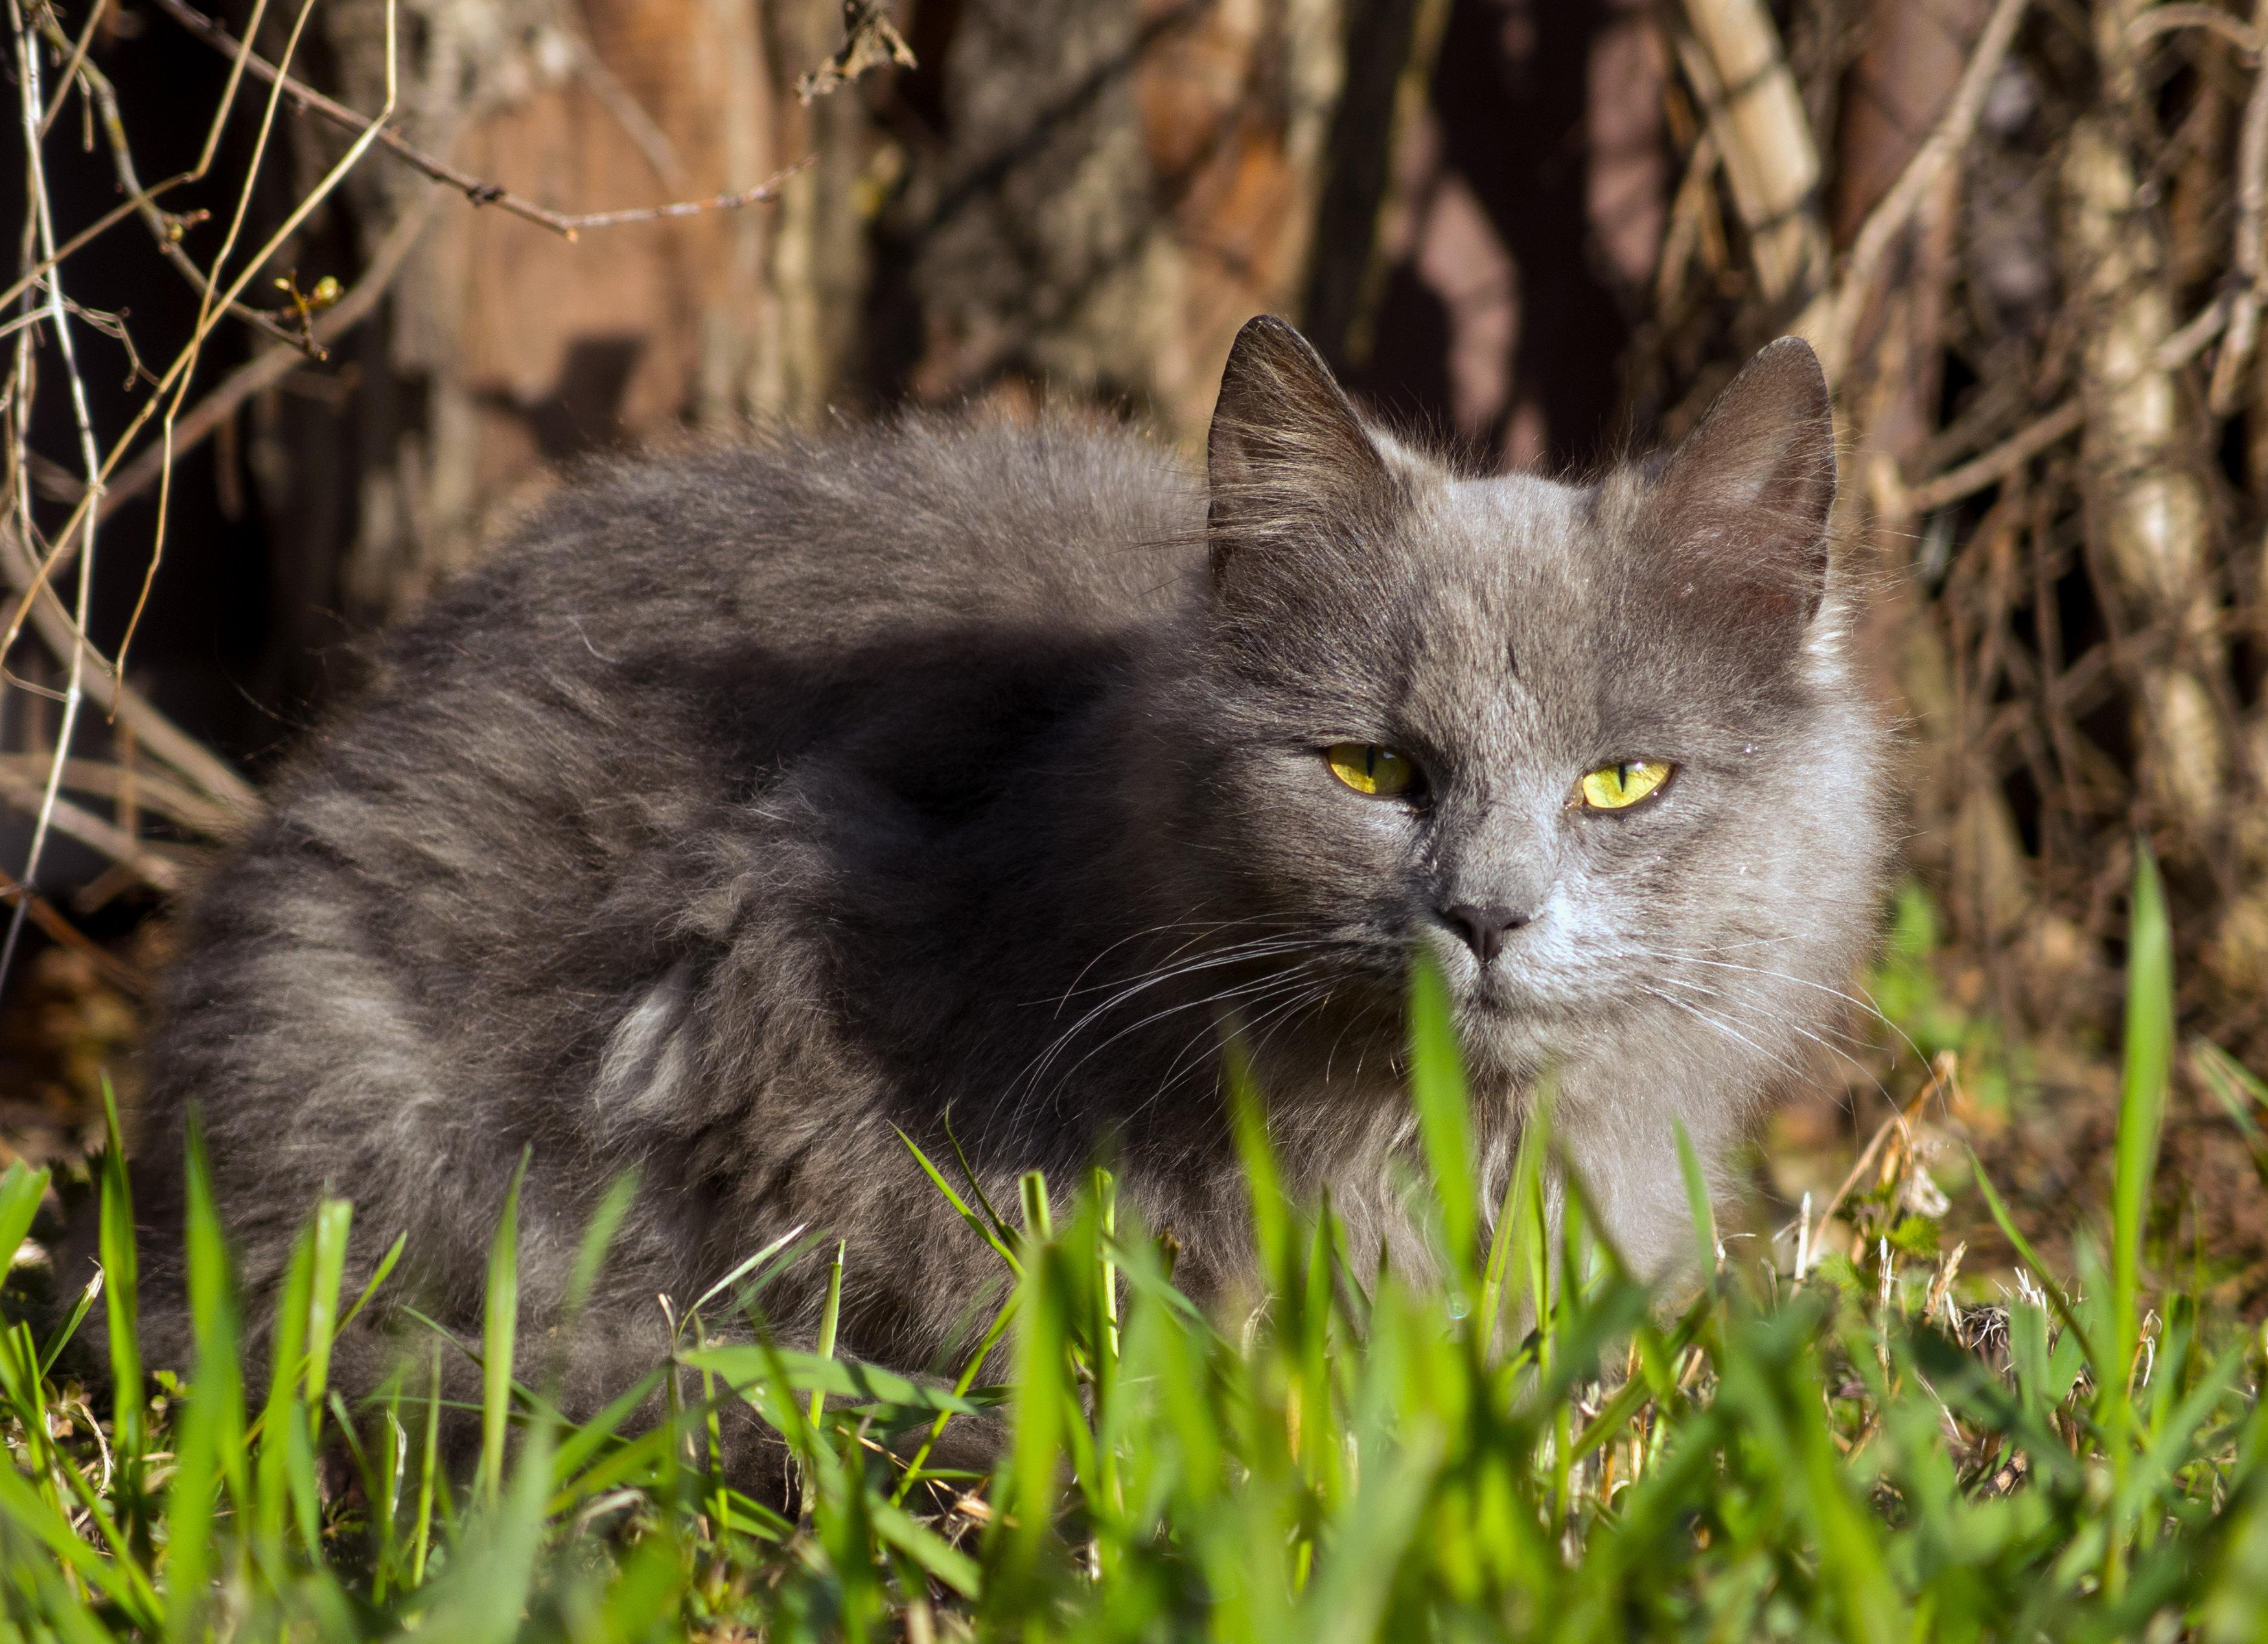 Gray Cat In Grass Free Stock Photo Libreshot